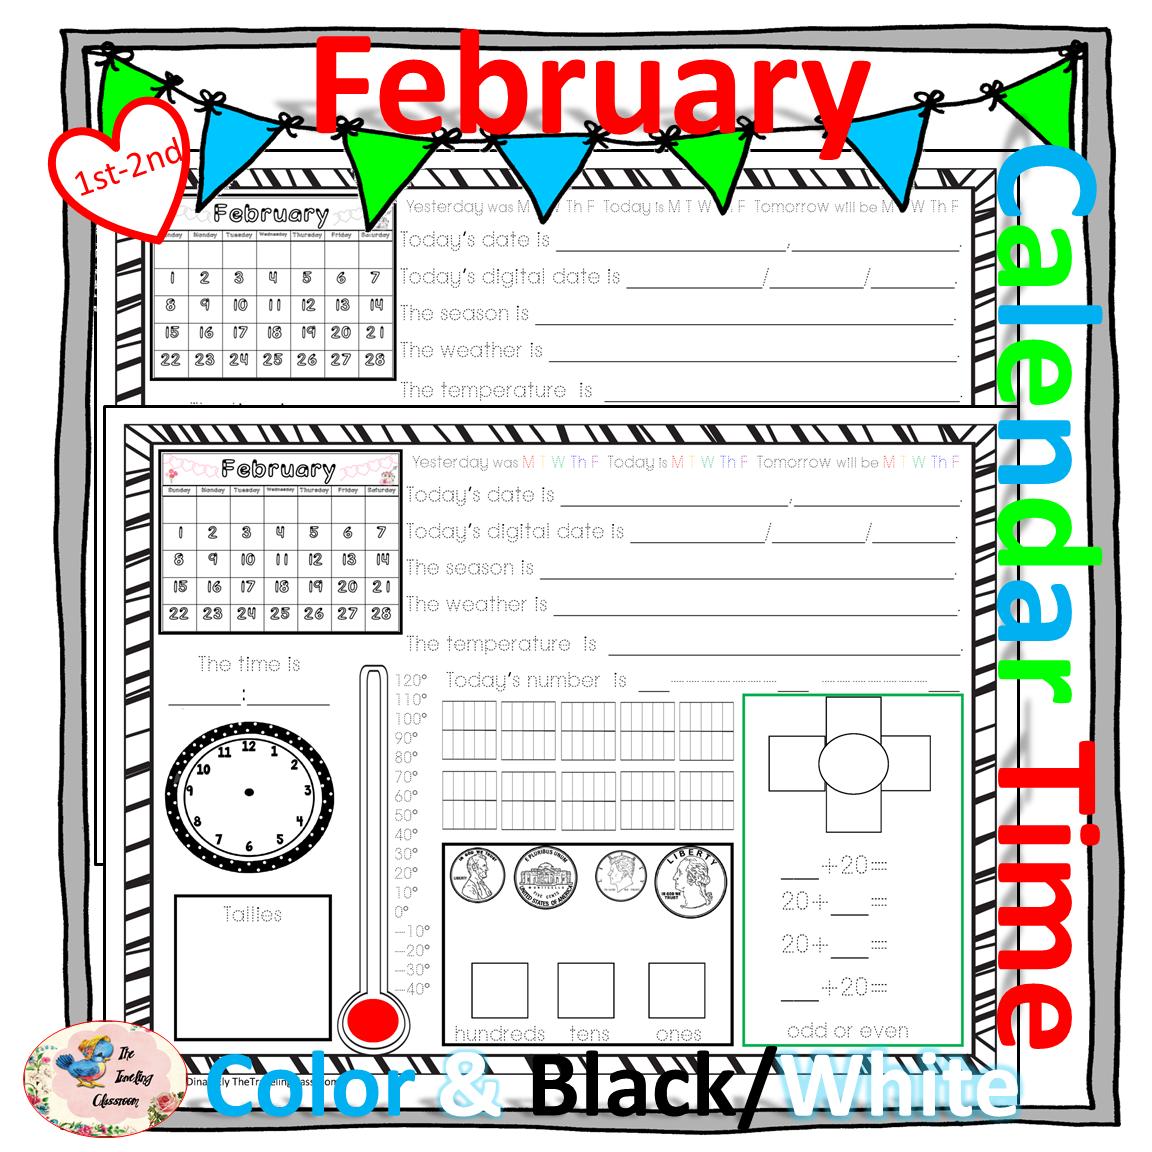 morning work calendar time worksheets february 2018 calendar time worksheets and math. Black Bedroom Furniture Sets. Home Design Ideas